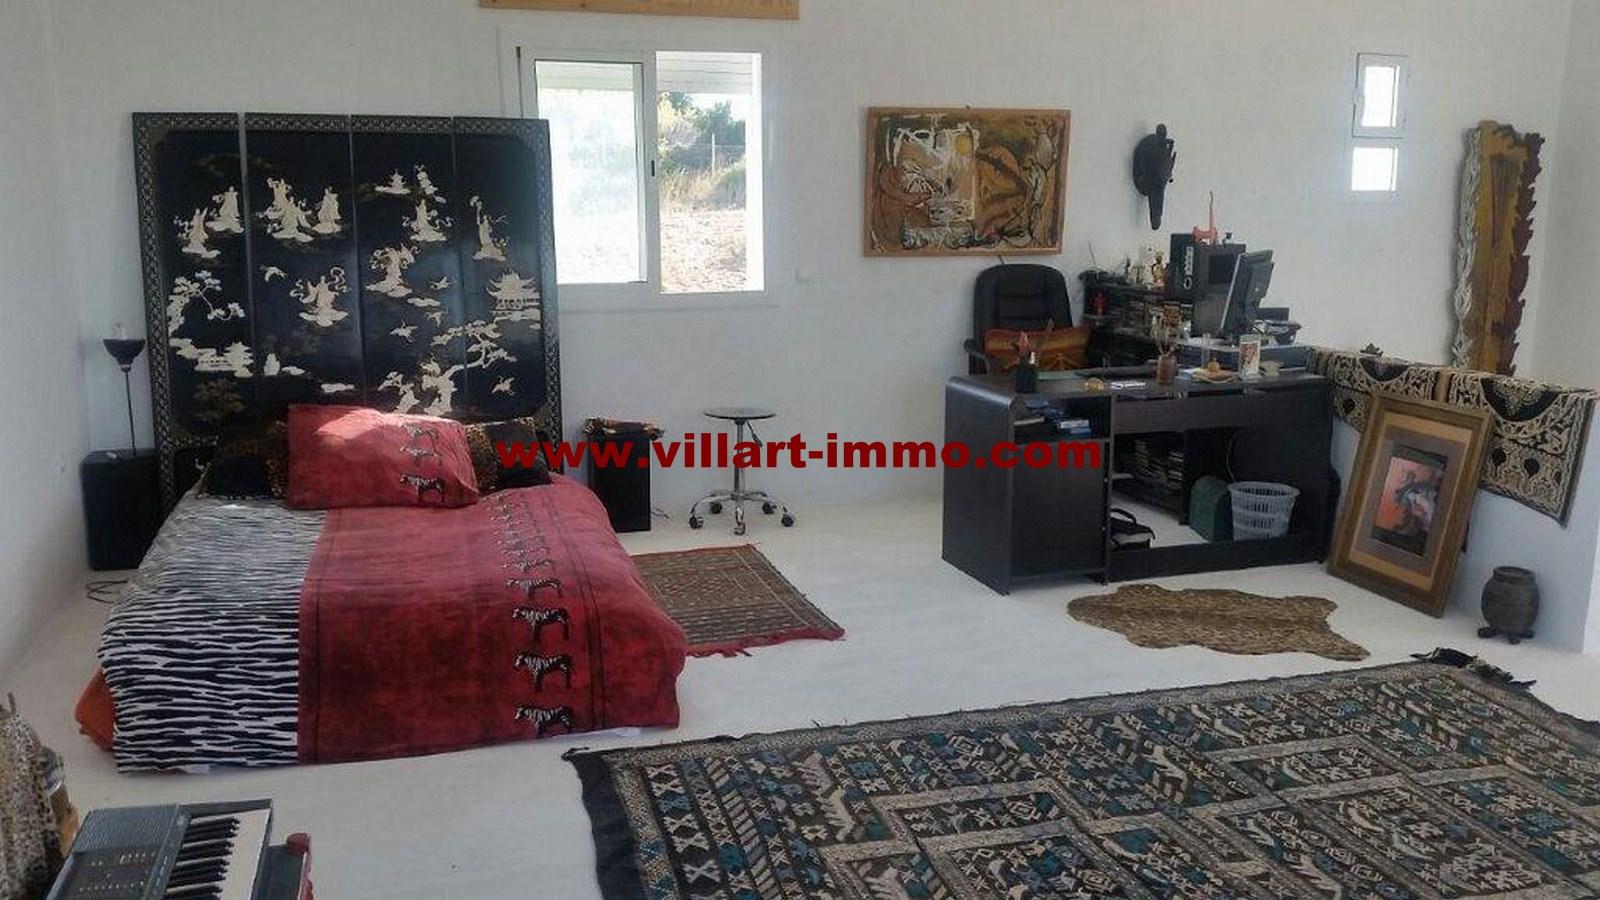 10-vente-villa-tanger-autres-chambre-2-vv454-villart-immo